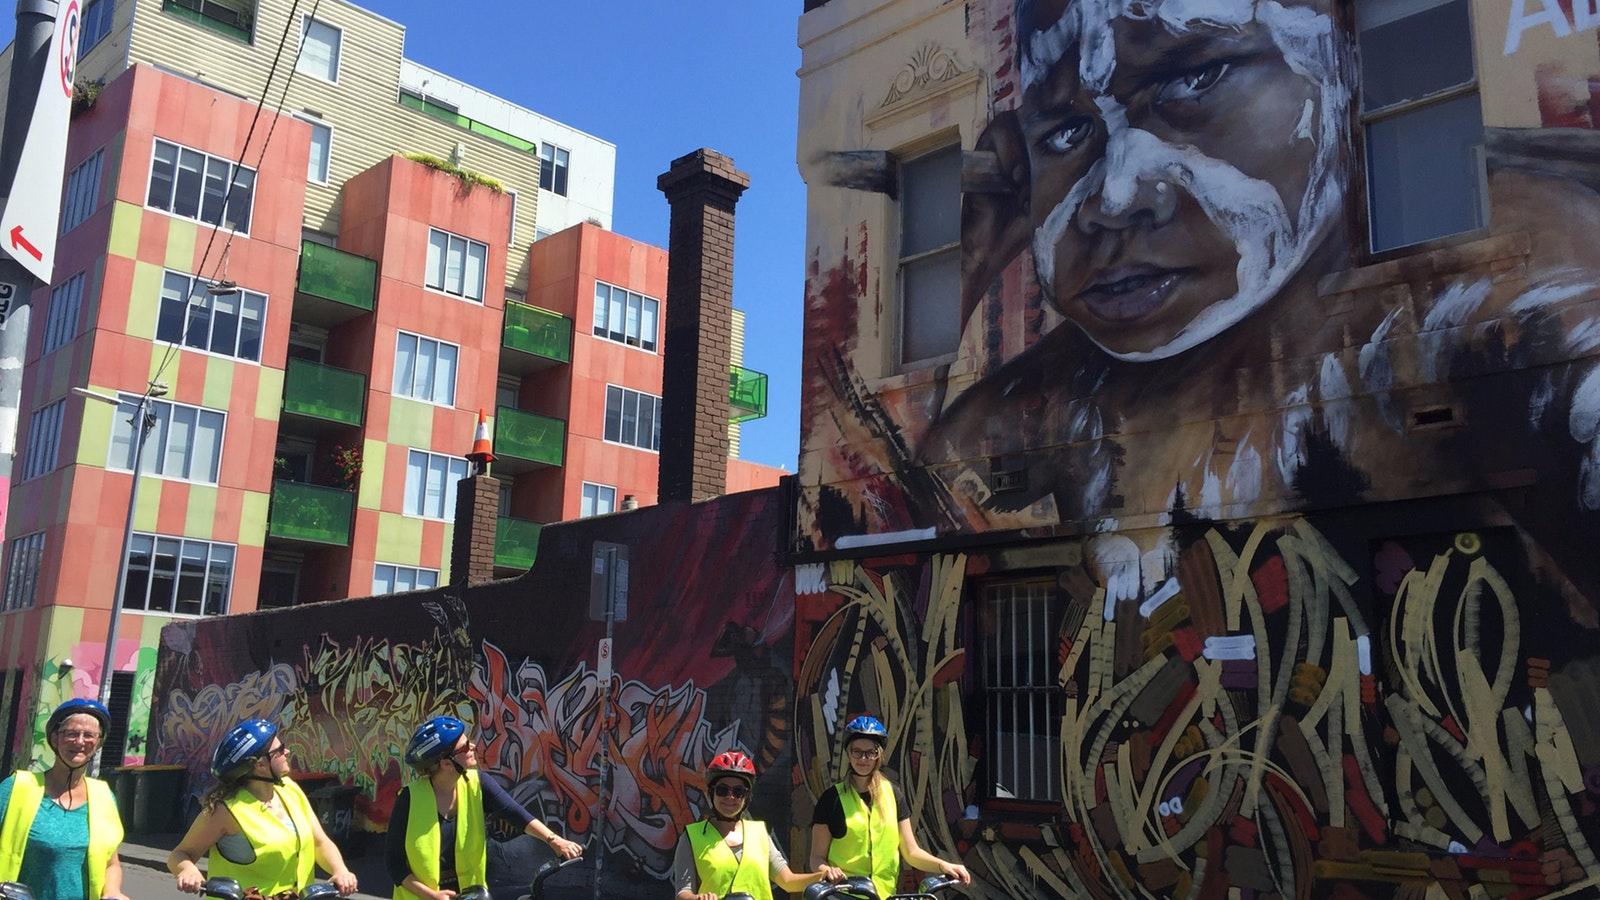 Appreciating street art on tour